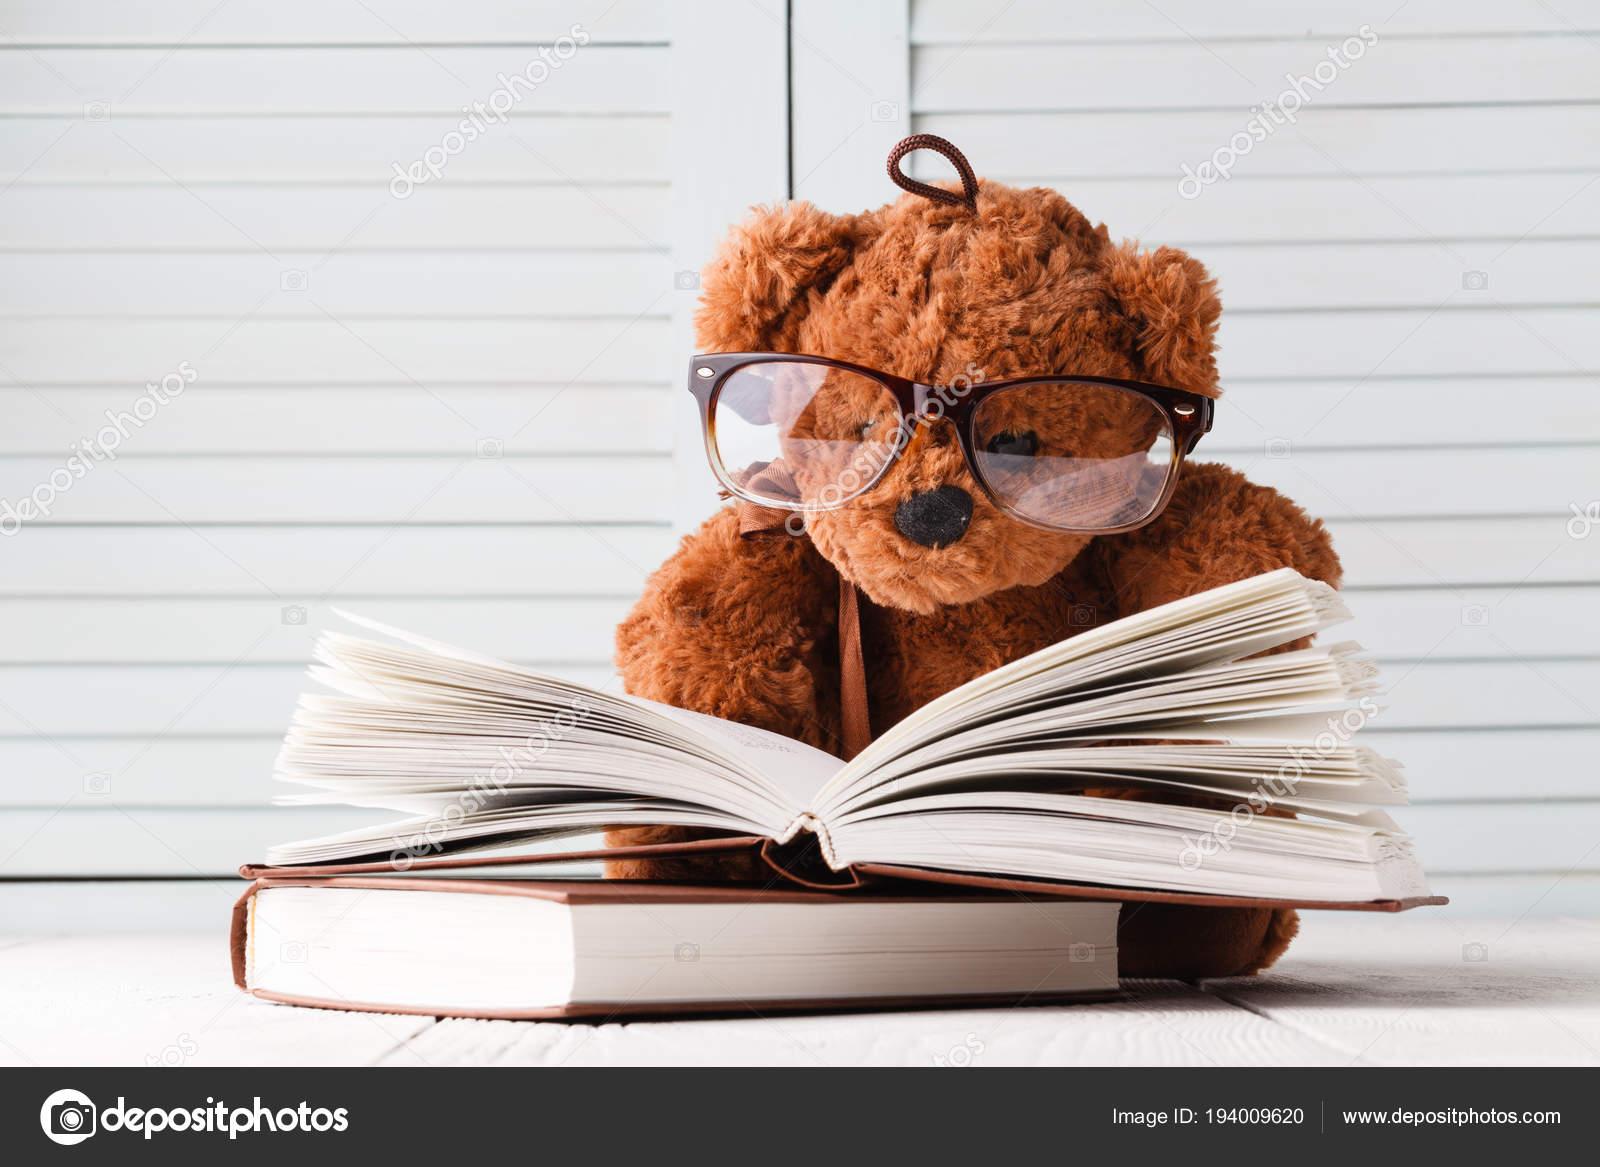 bambino libriFoto del con e Storia Stock orsacchiotto e2IWHYDE9